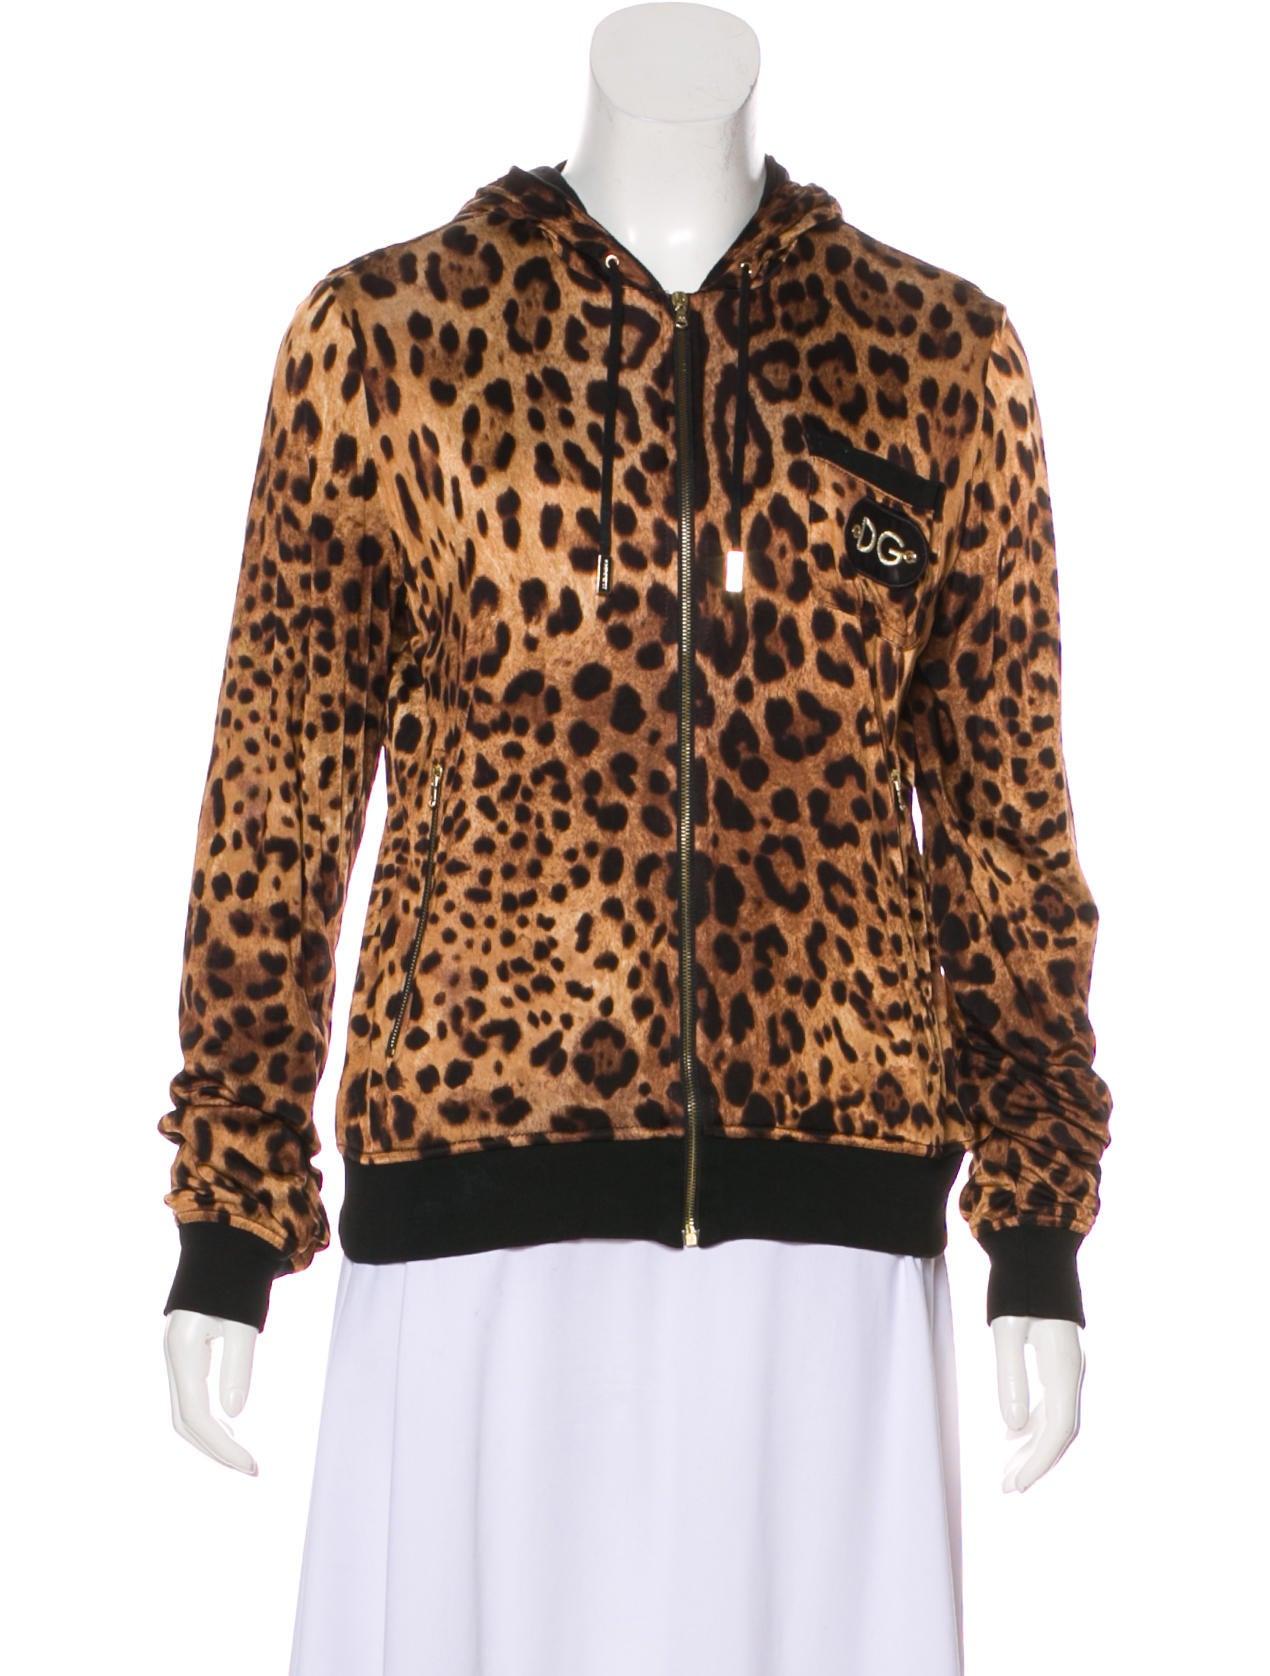 bcaf1f0509a4 Dolce & Gabbana Leopard Print Hooded Jacket - Clothing - DAG128329 ...